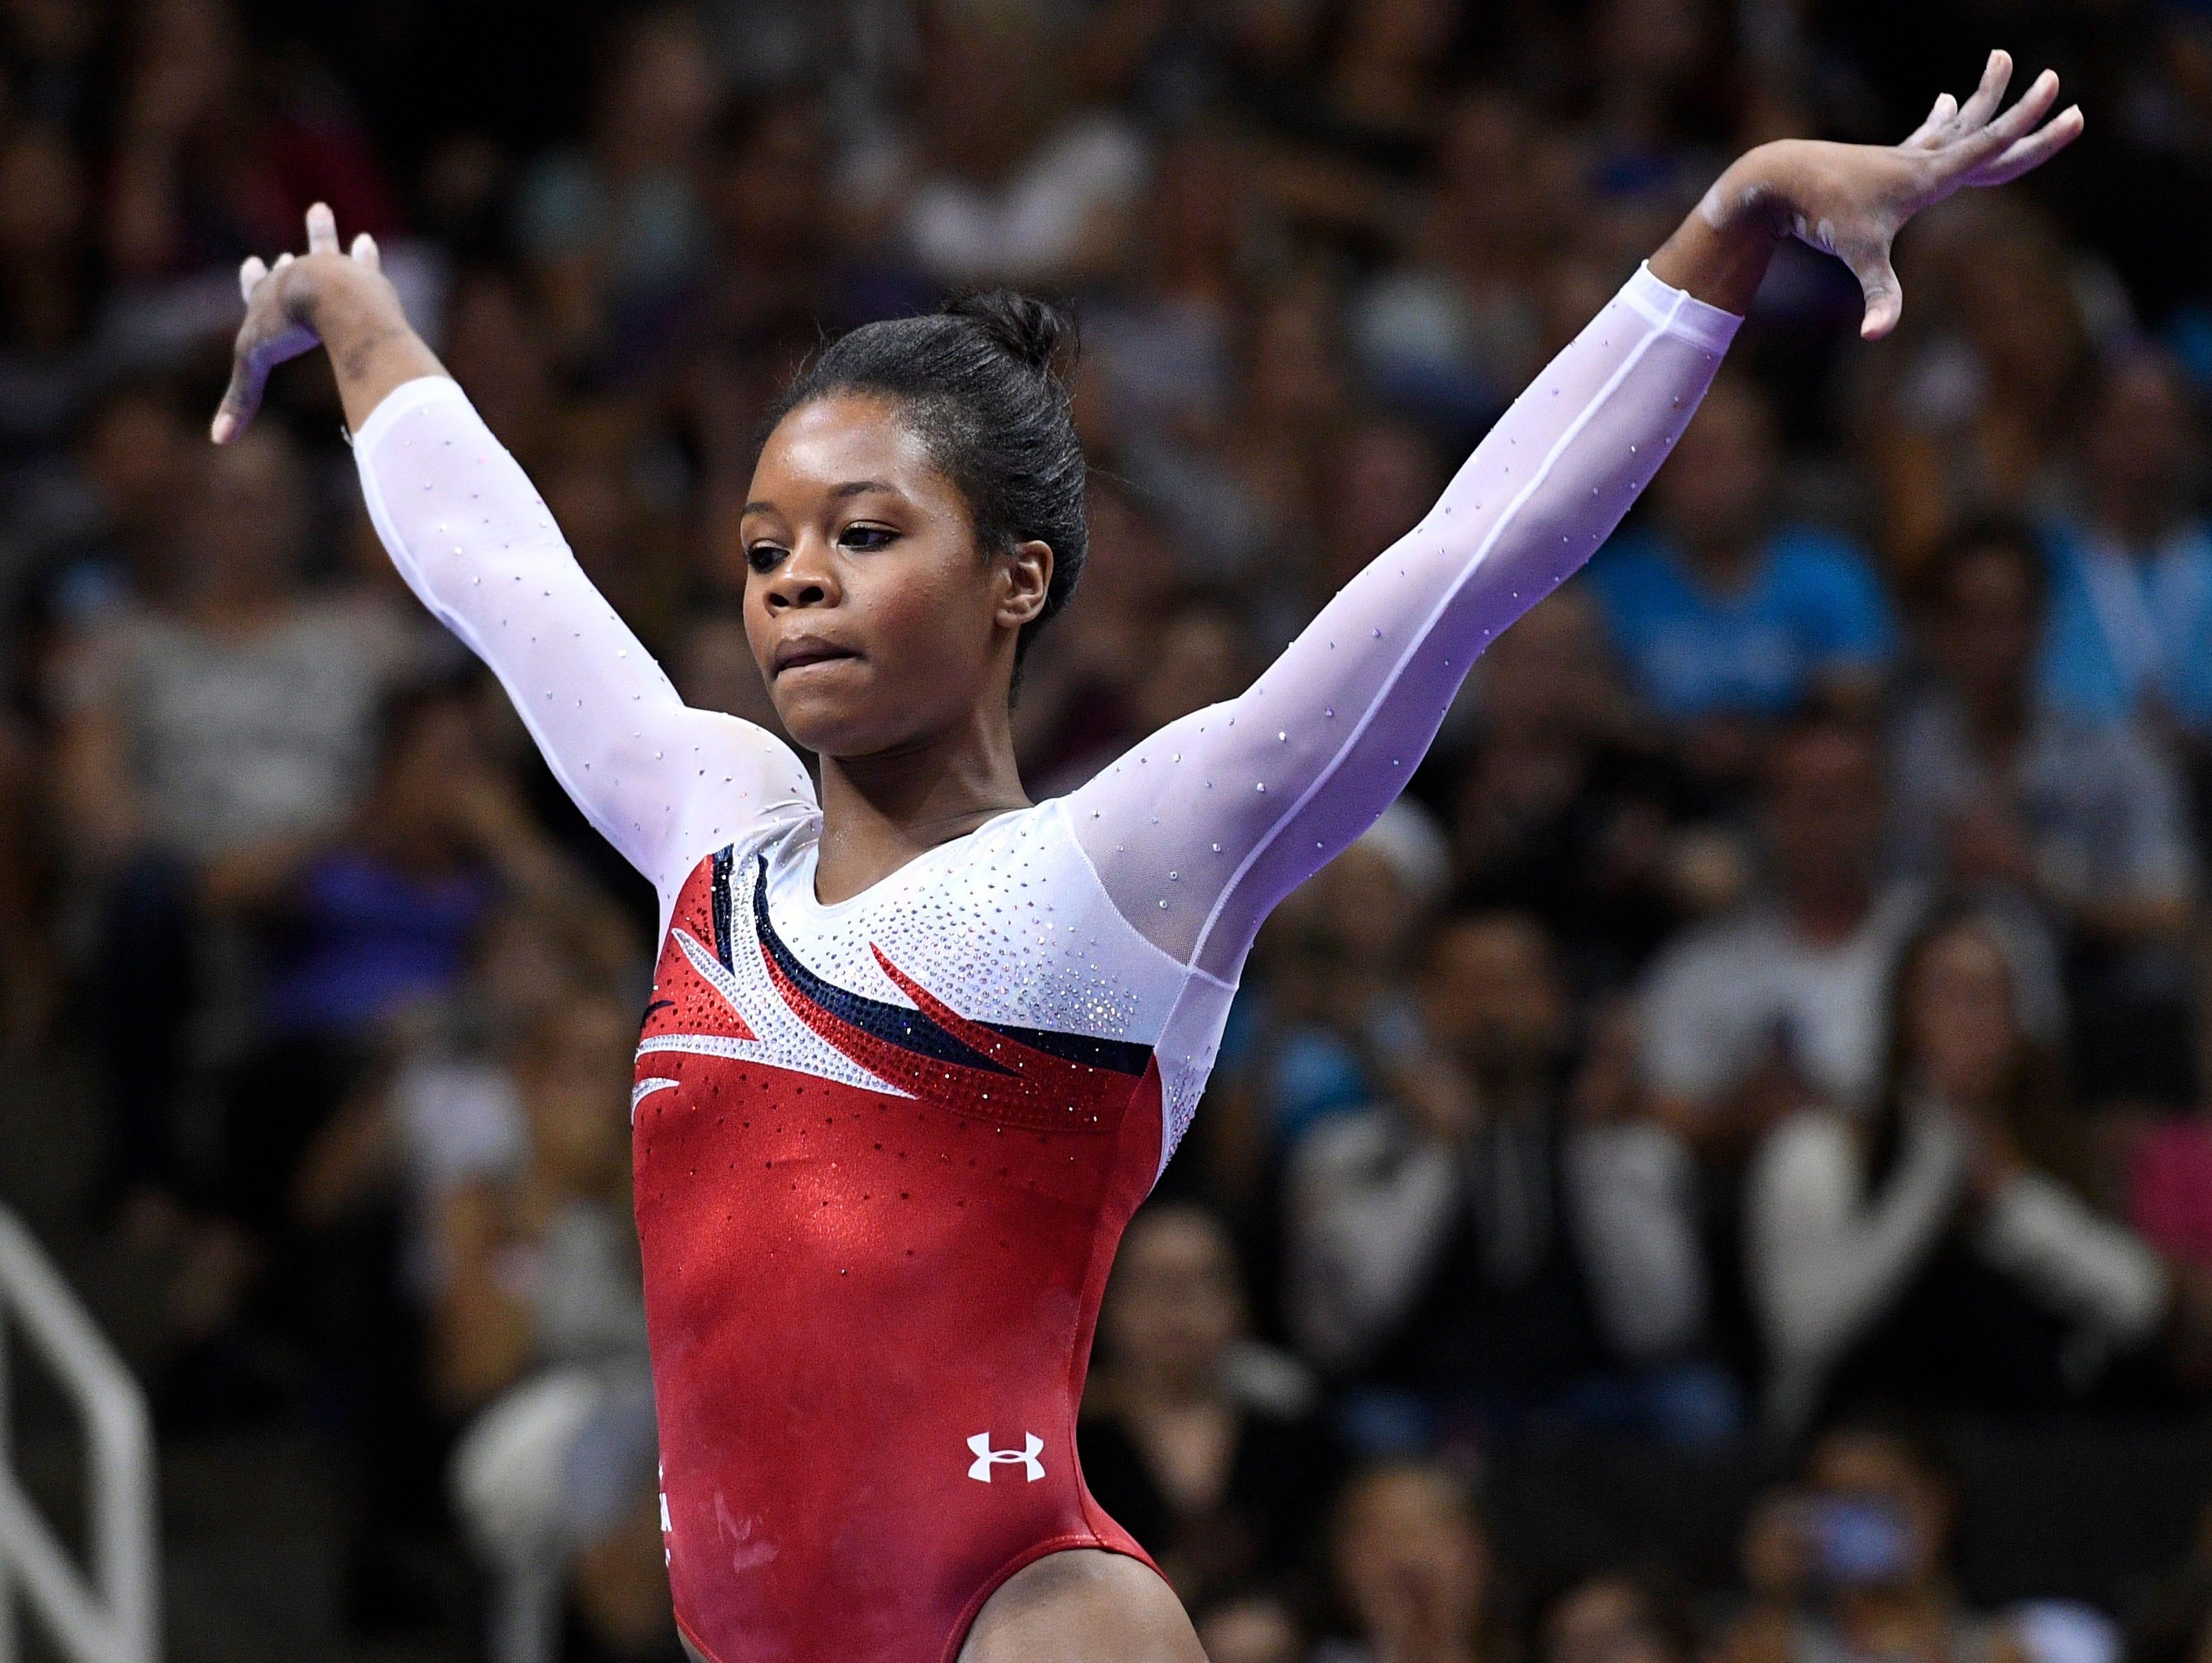 Floor Gymnastics Gabby Intended Gymnastics Us Olympic Team Trials Womens Gymnastics Gymnasts Gabby Douglas Aly Raisman Beat Odds By Making Second